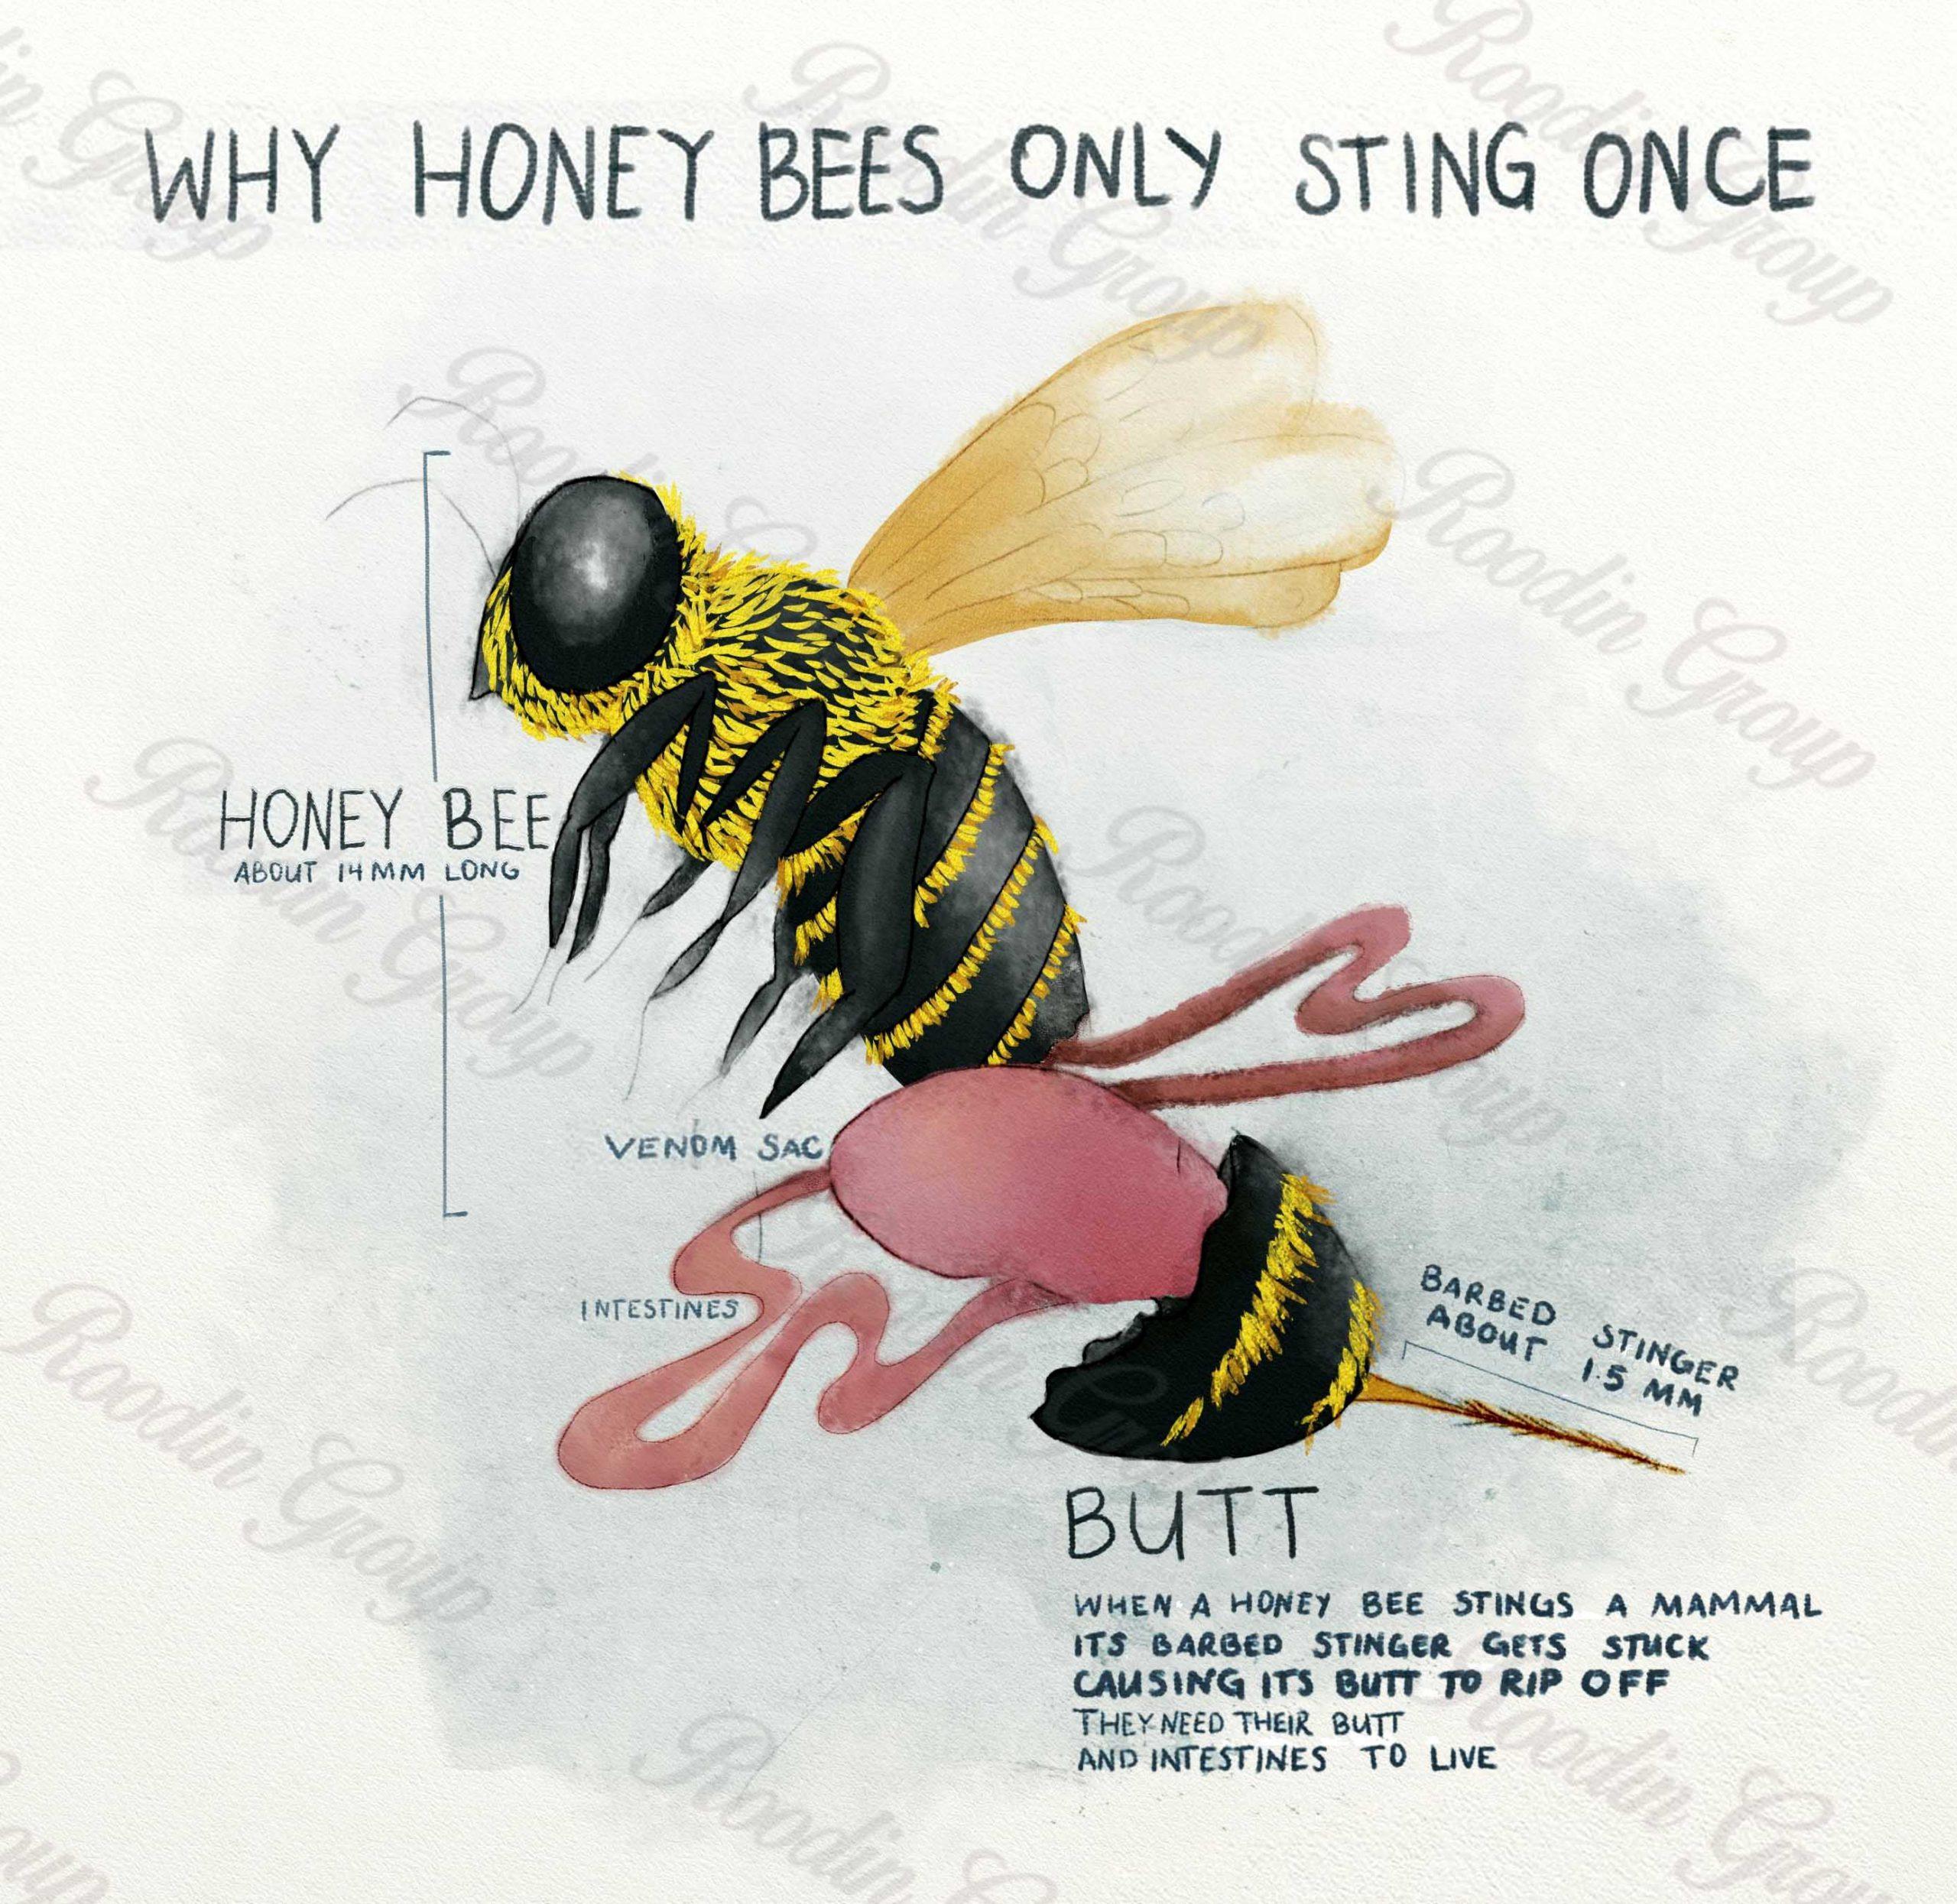 Honey bee venom production